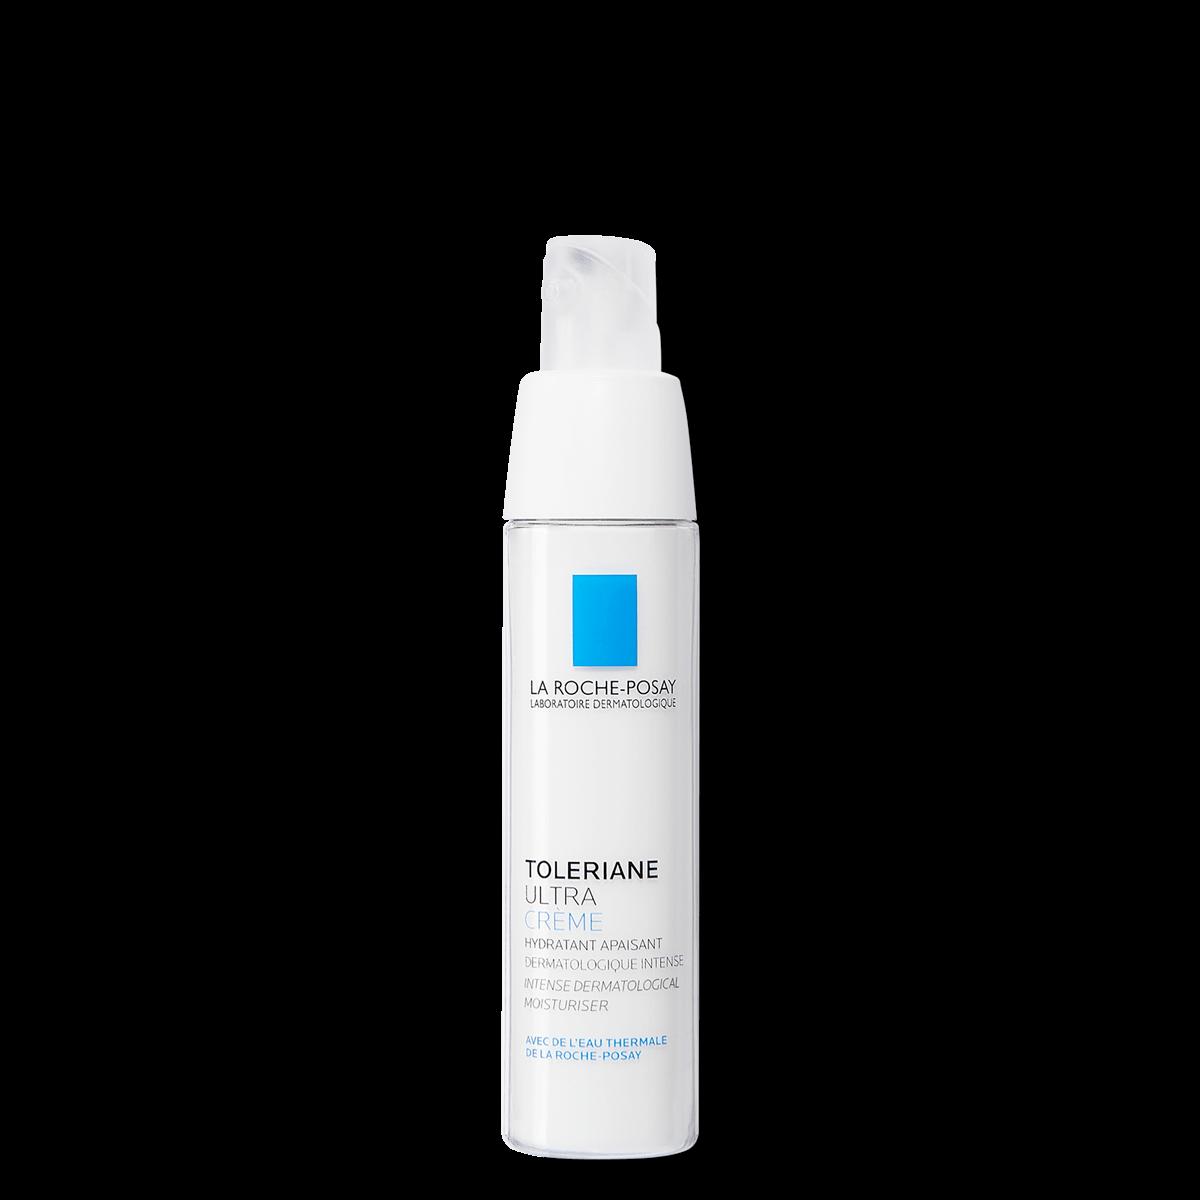 LaRochePosay Product Allergic Toleriane UltraCream 40ml 3337872412486 FSS 2